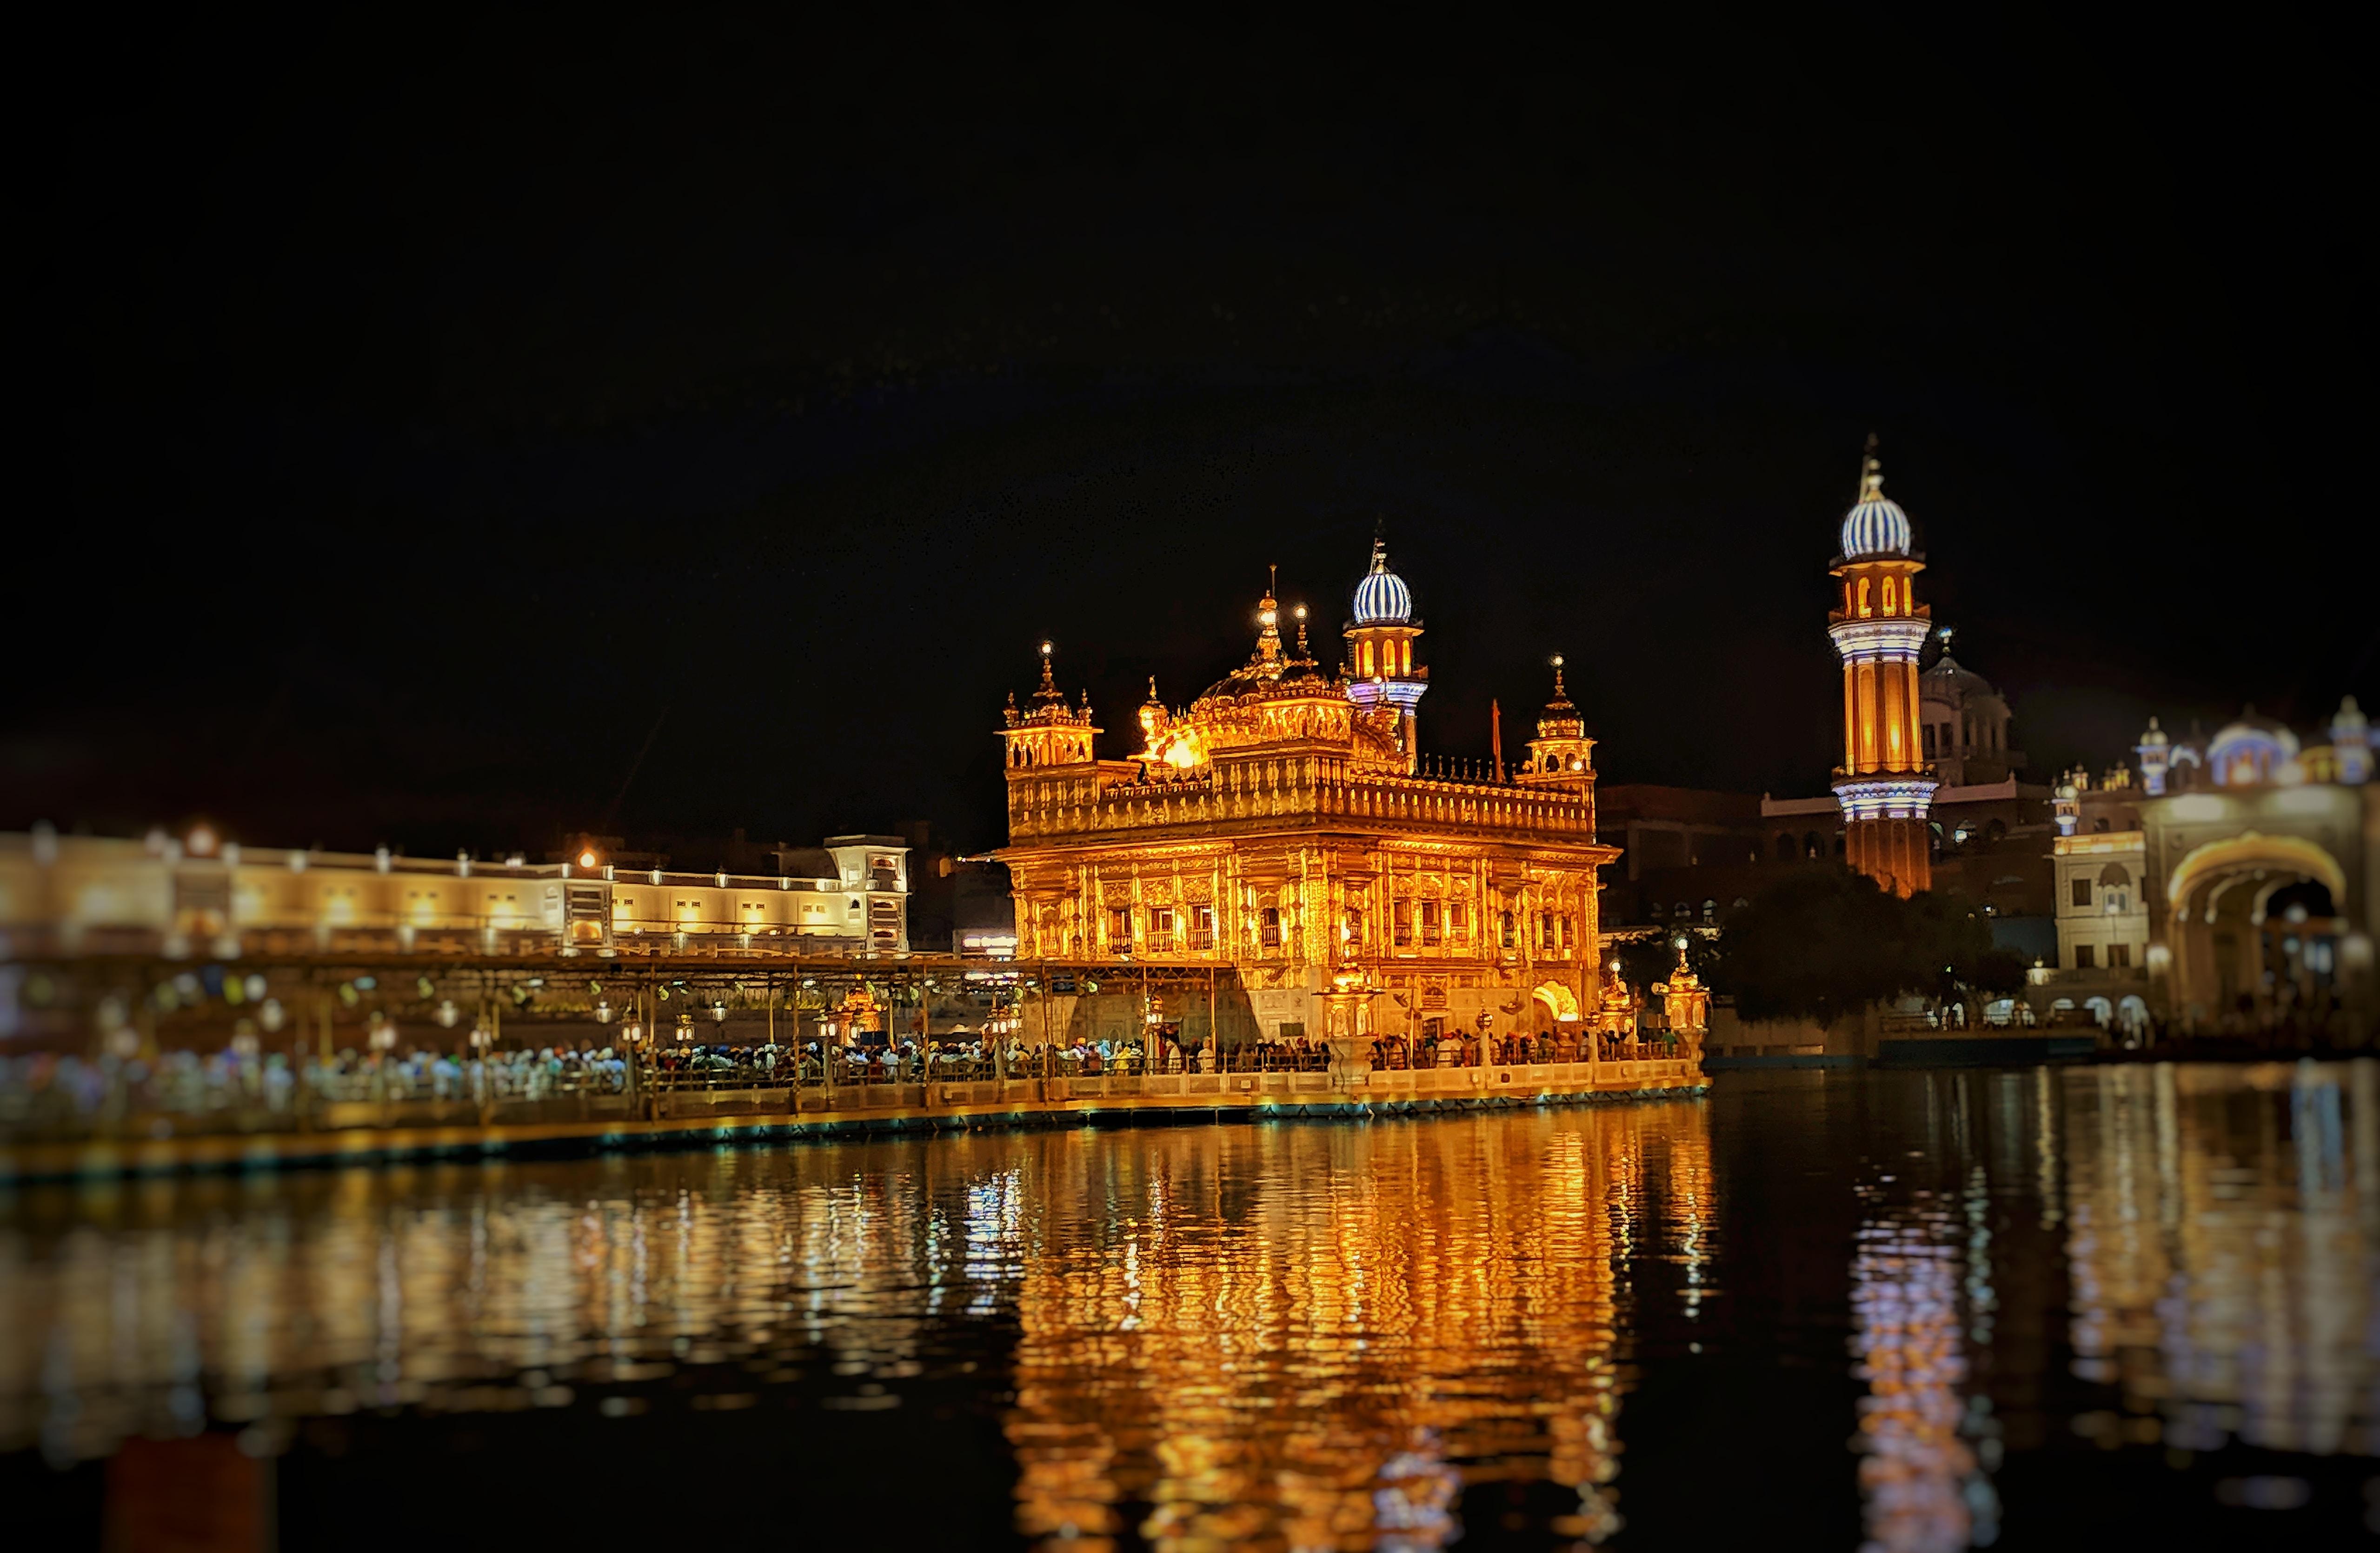 Image by Harsharan Singh